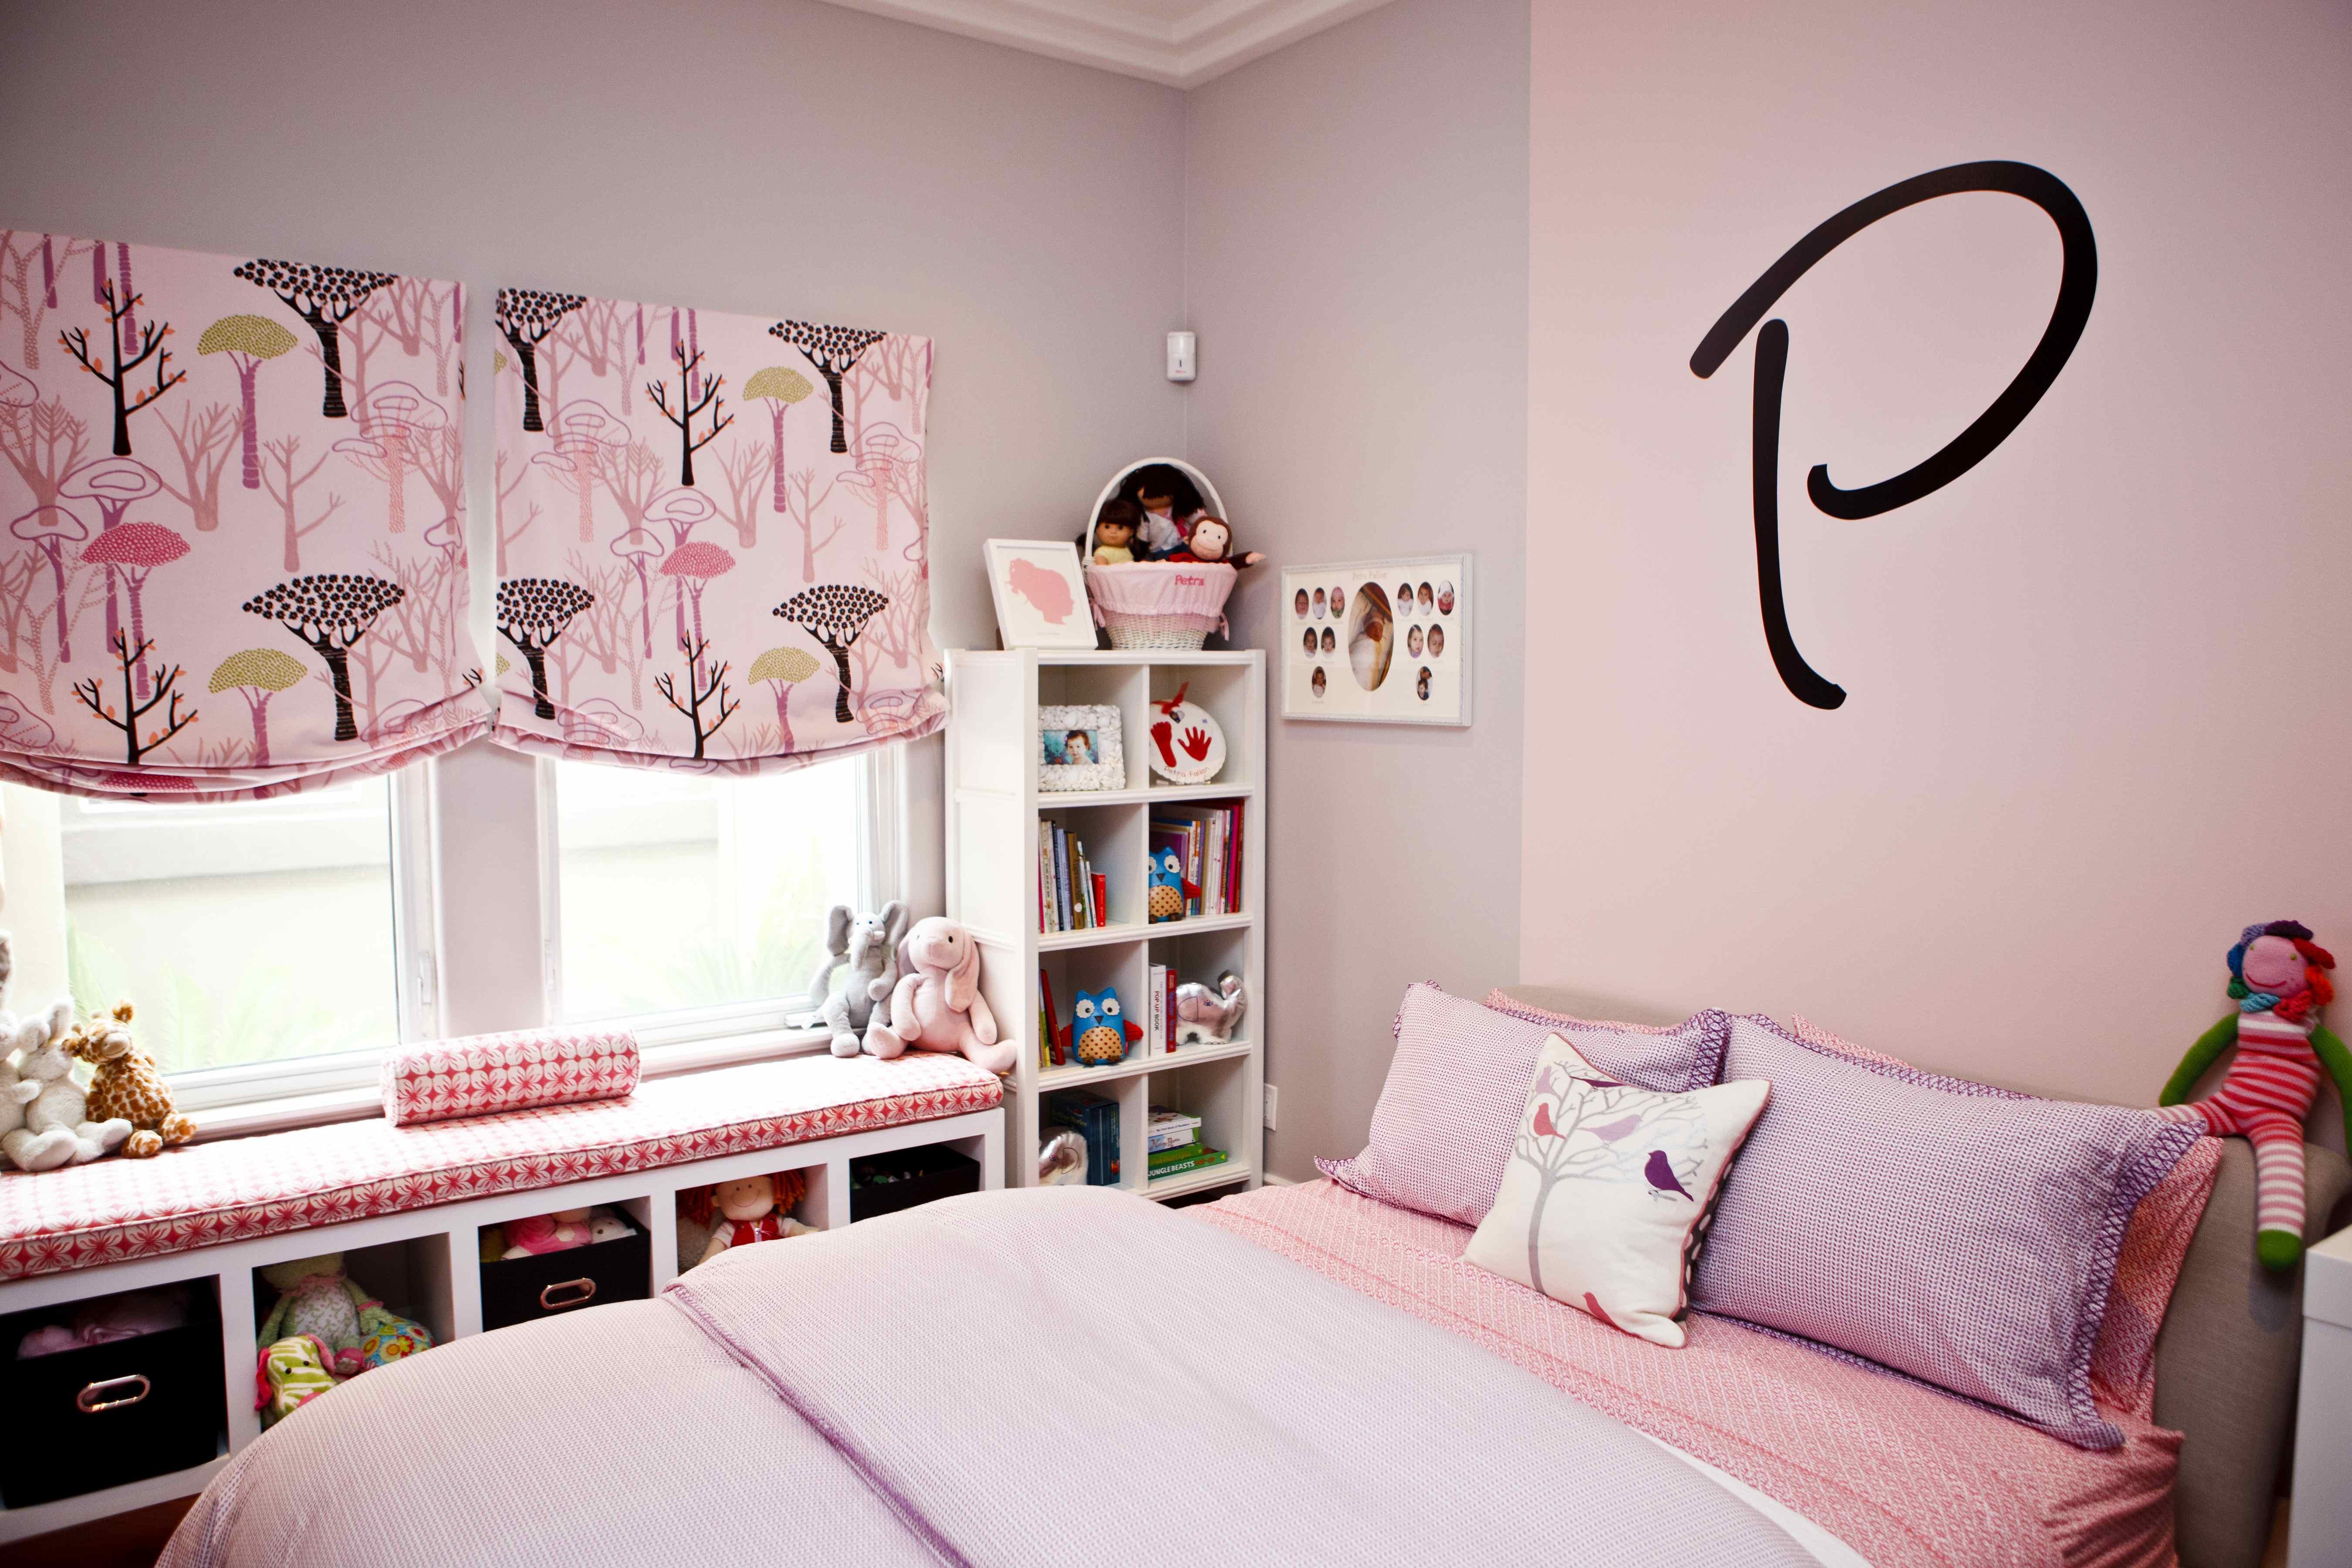 Design Reveal: A Modern Toddler Room on Room Decoration Girl  id=85032